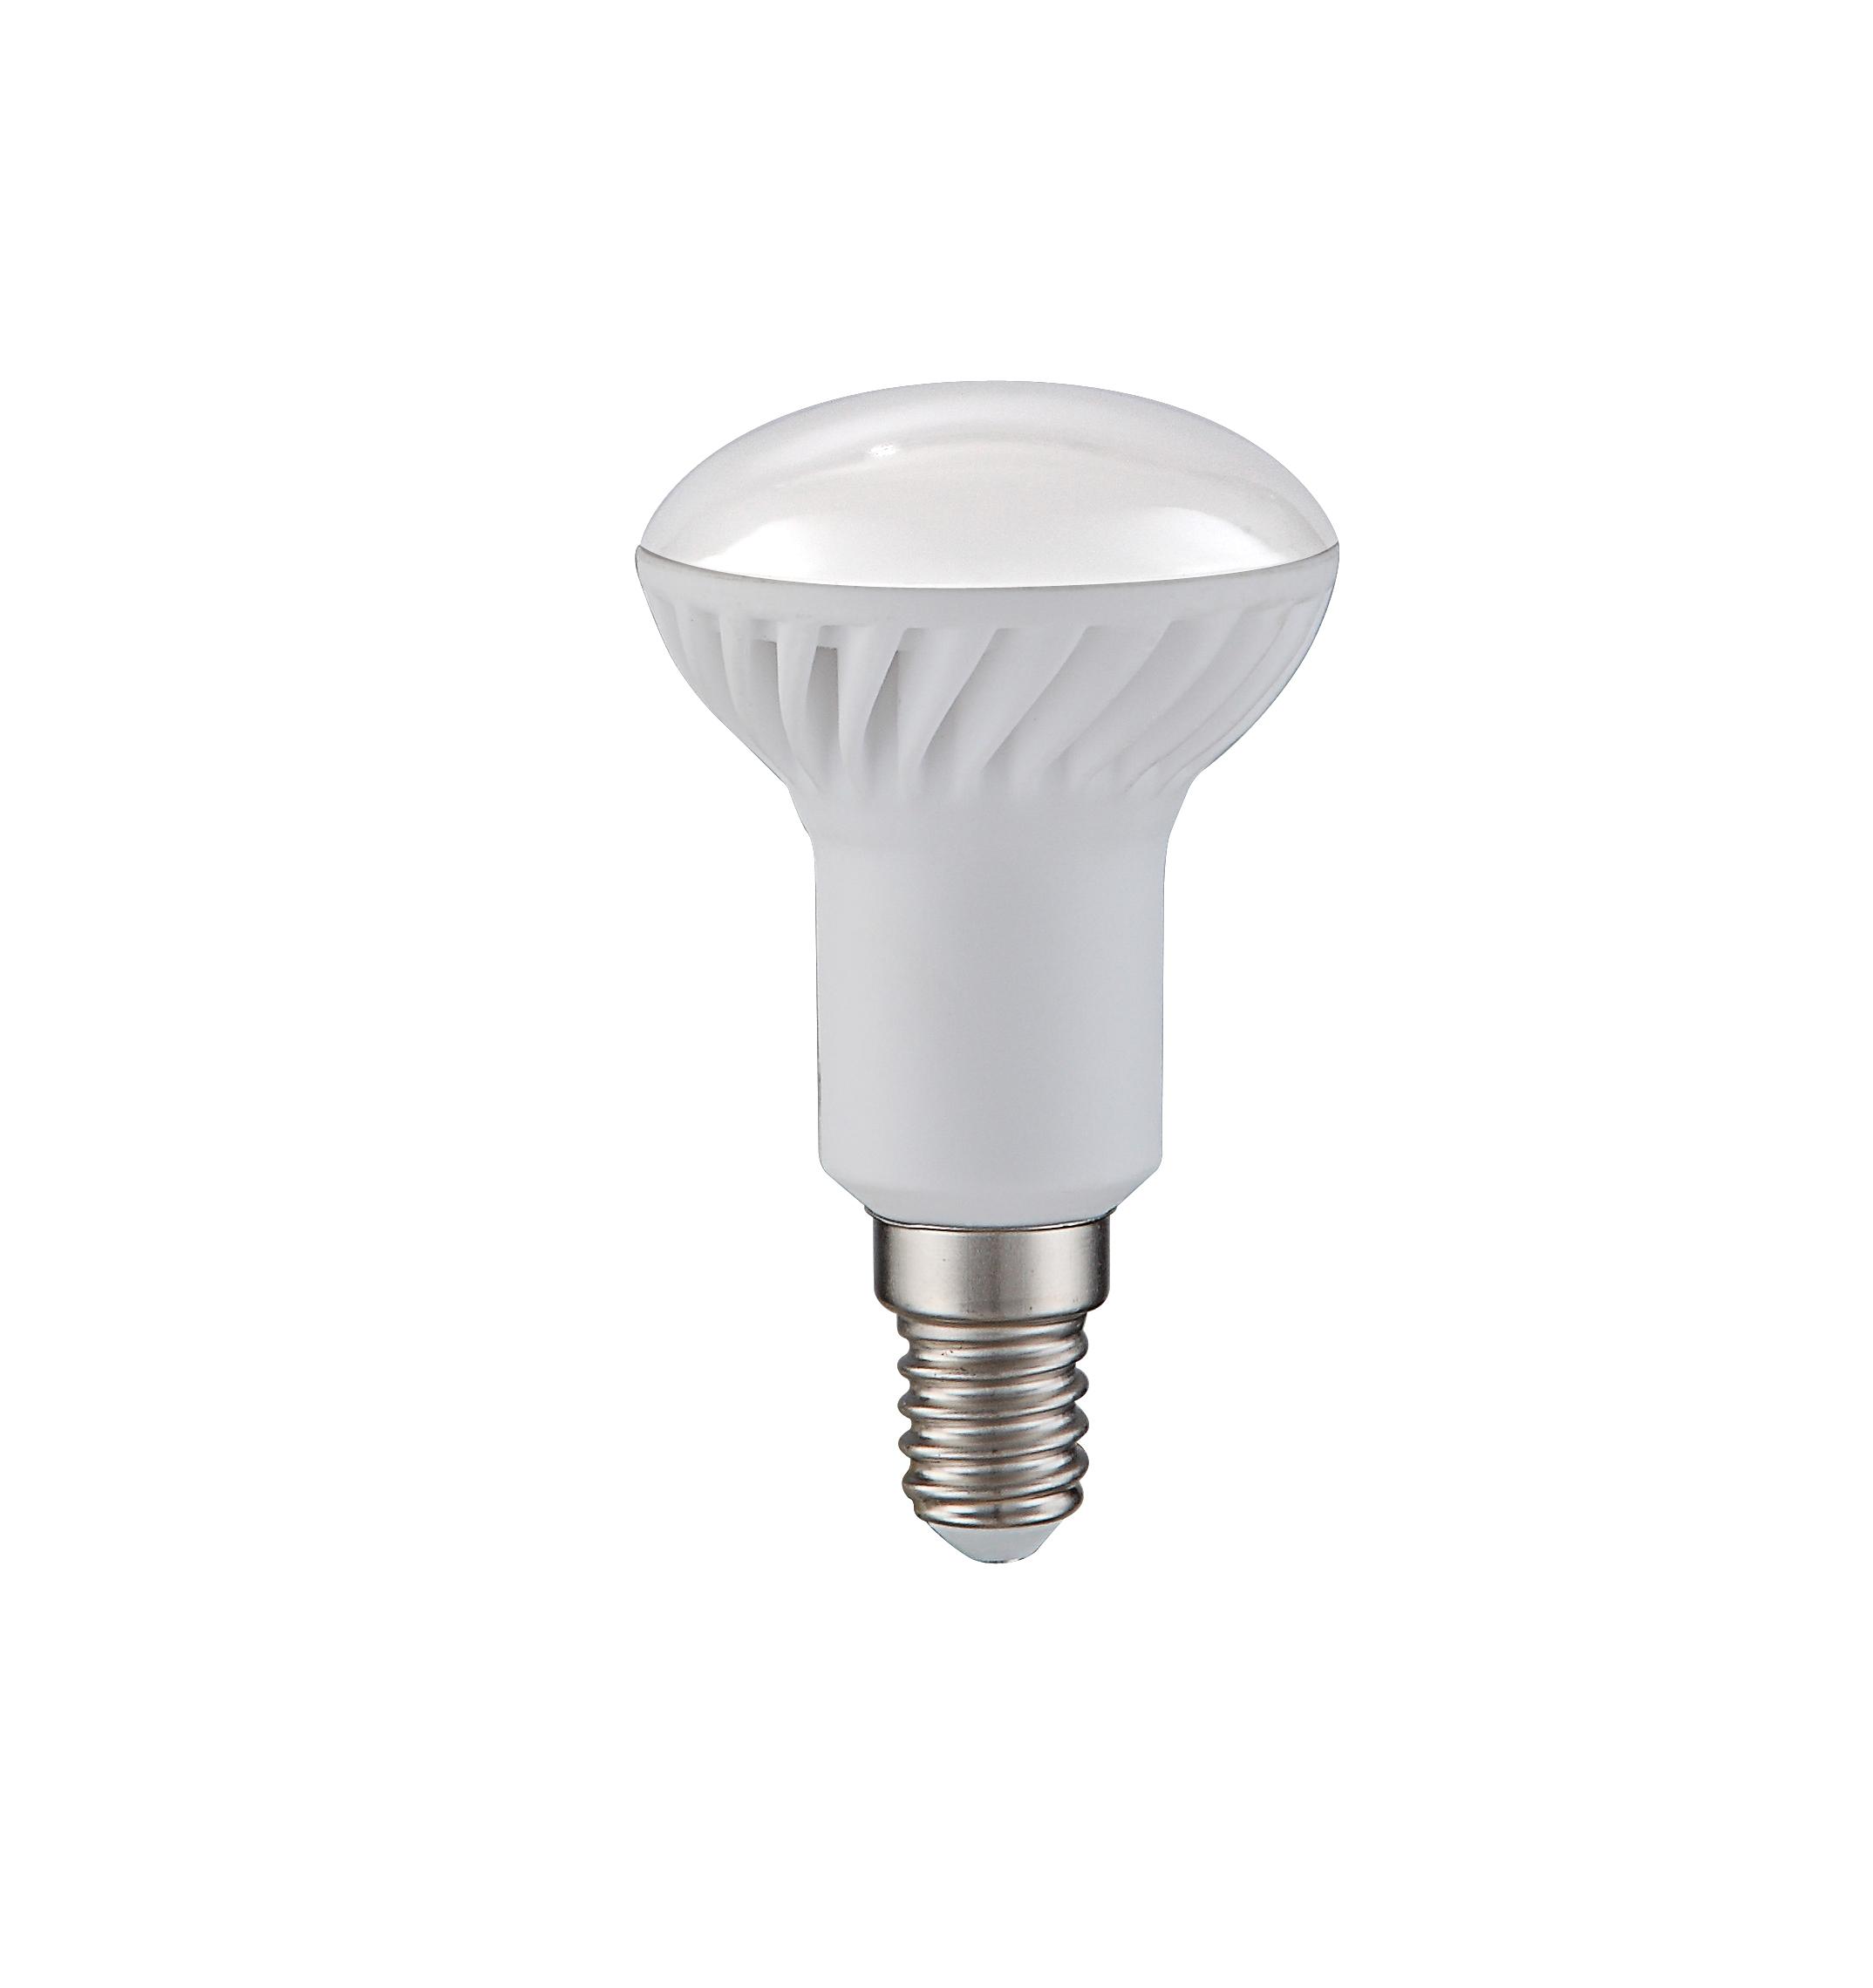 Lampen Leuchten Led Online Kaufen: LED - LEUCHTMITTEL